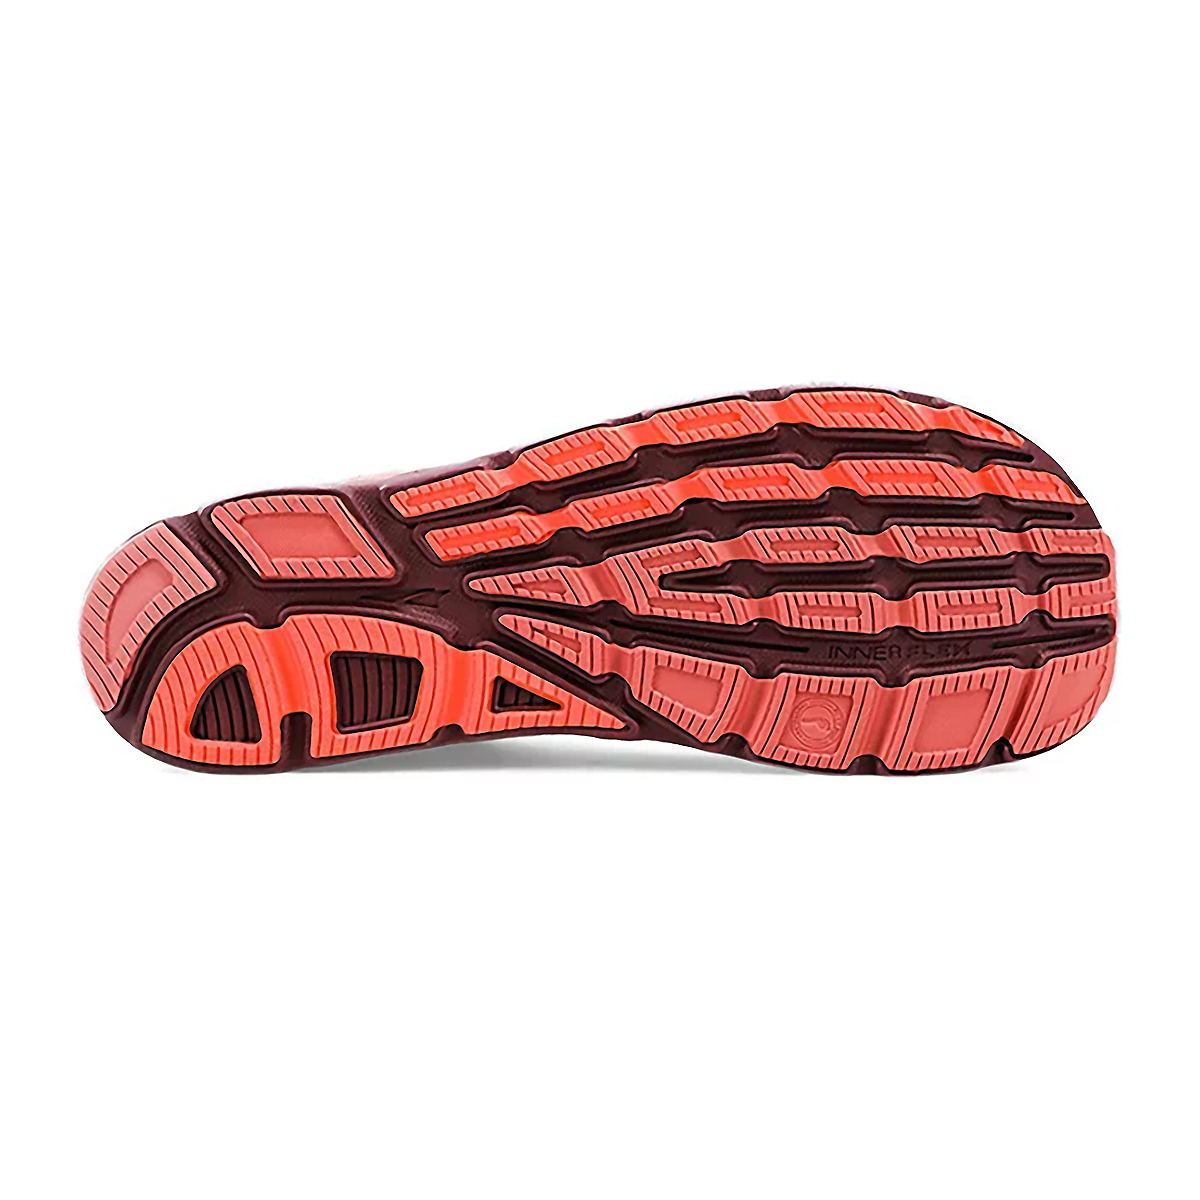 Women's Altra Torin 4.5 Plush Running Shoe - Color: Misty Rose - Size: 5.5 - Width: Regular, Misty Rose, large, image 4